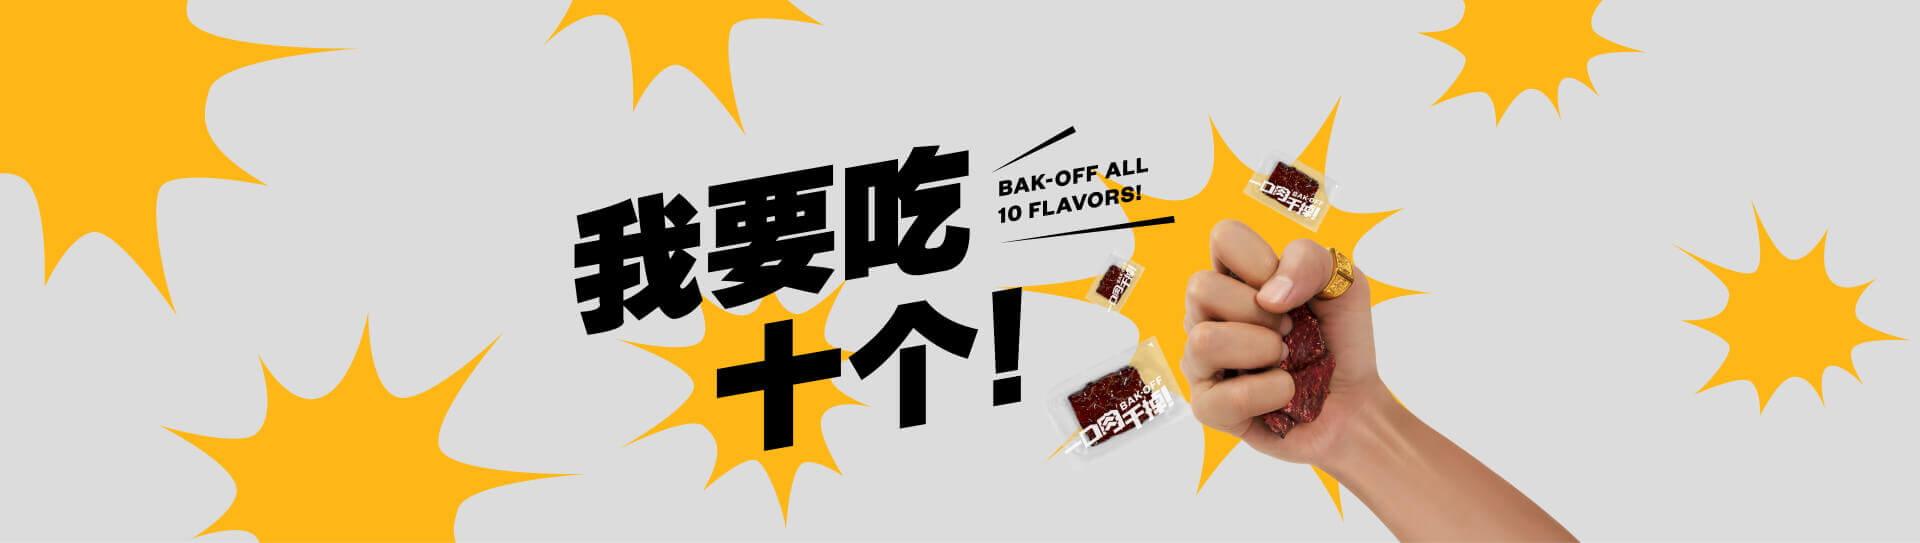 BAK-OFF!